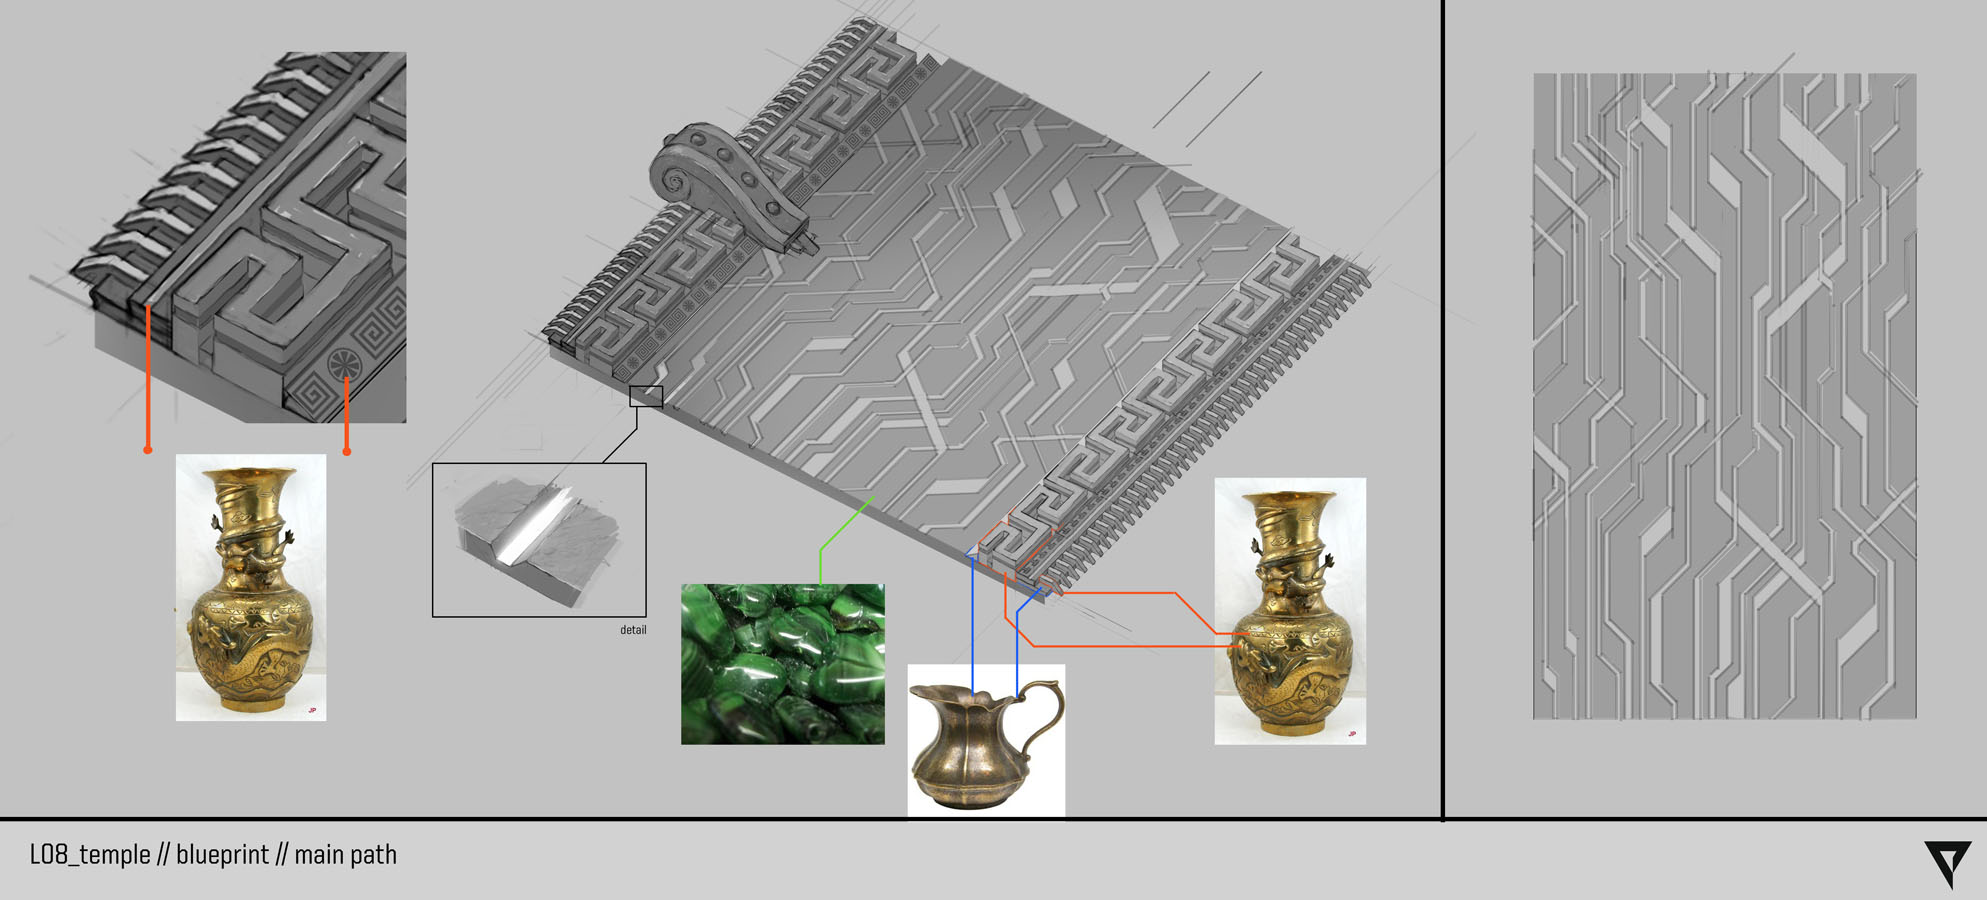 L08_temple_blueprint_main path 1.jpg